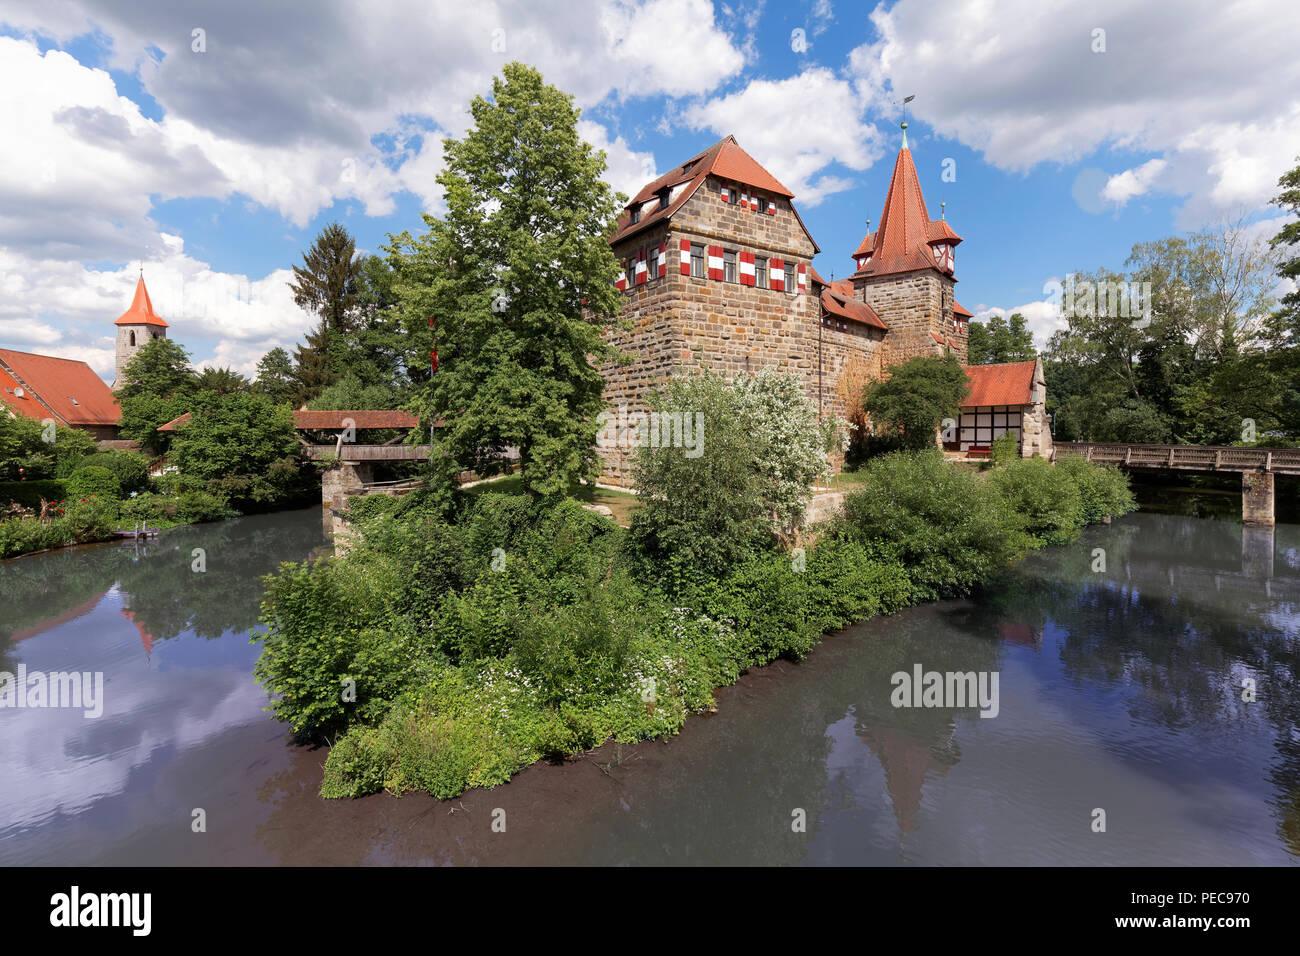 Lauf Castle, River Pegnitz, Lauf an der Pegnitz, Middle Franconia, Franconia, Bavaria, Germany - Stock Image